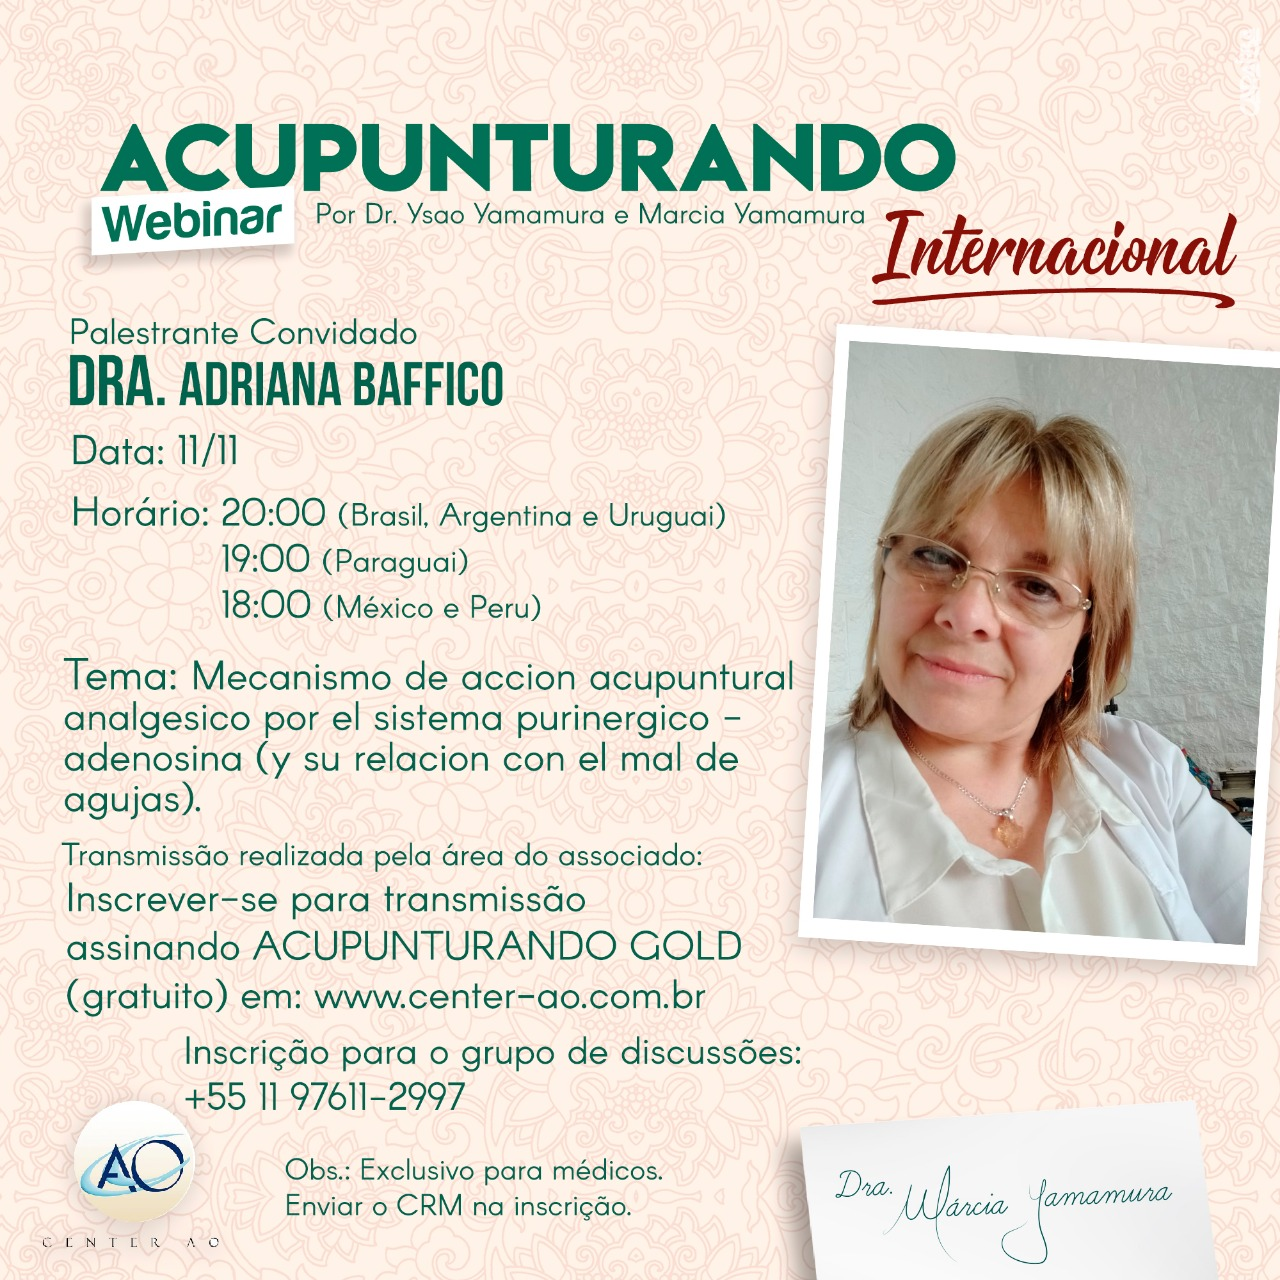 adriana baficco uruguai